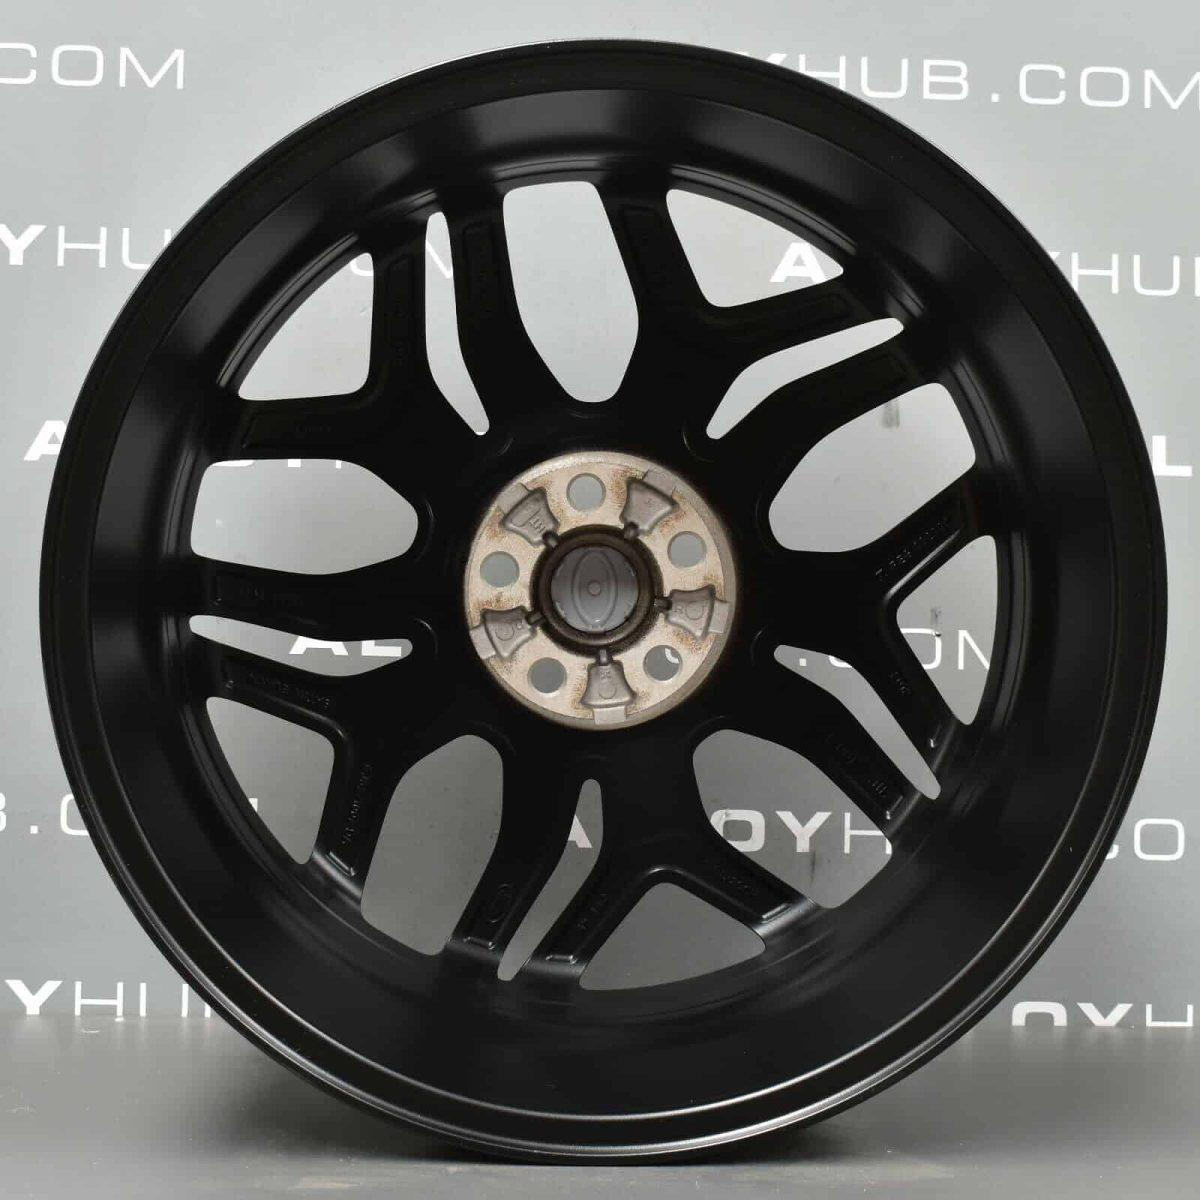 "Genuine Range Rover Evoque L538 20"" inch Style 5008 5 Split-Spoke Satin Black Alloy Wheels LR072182"